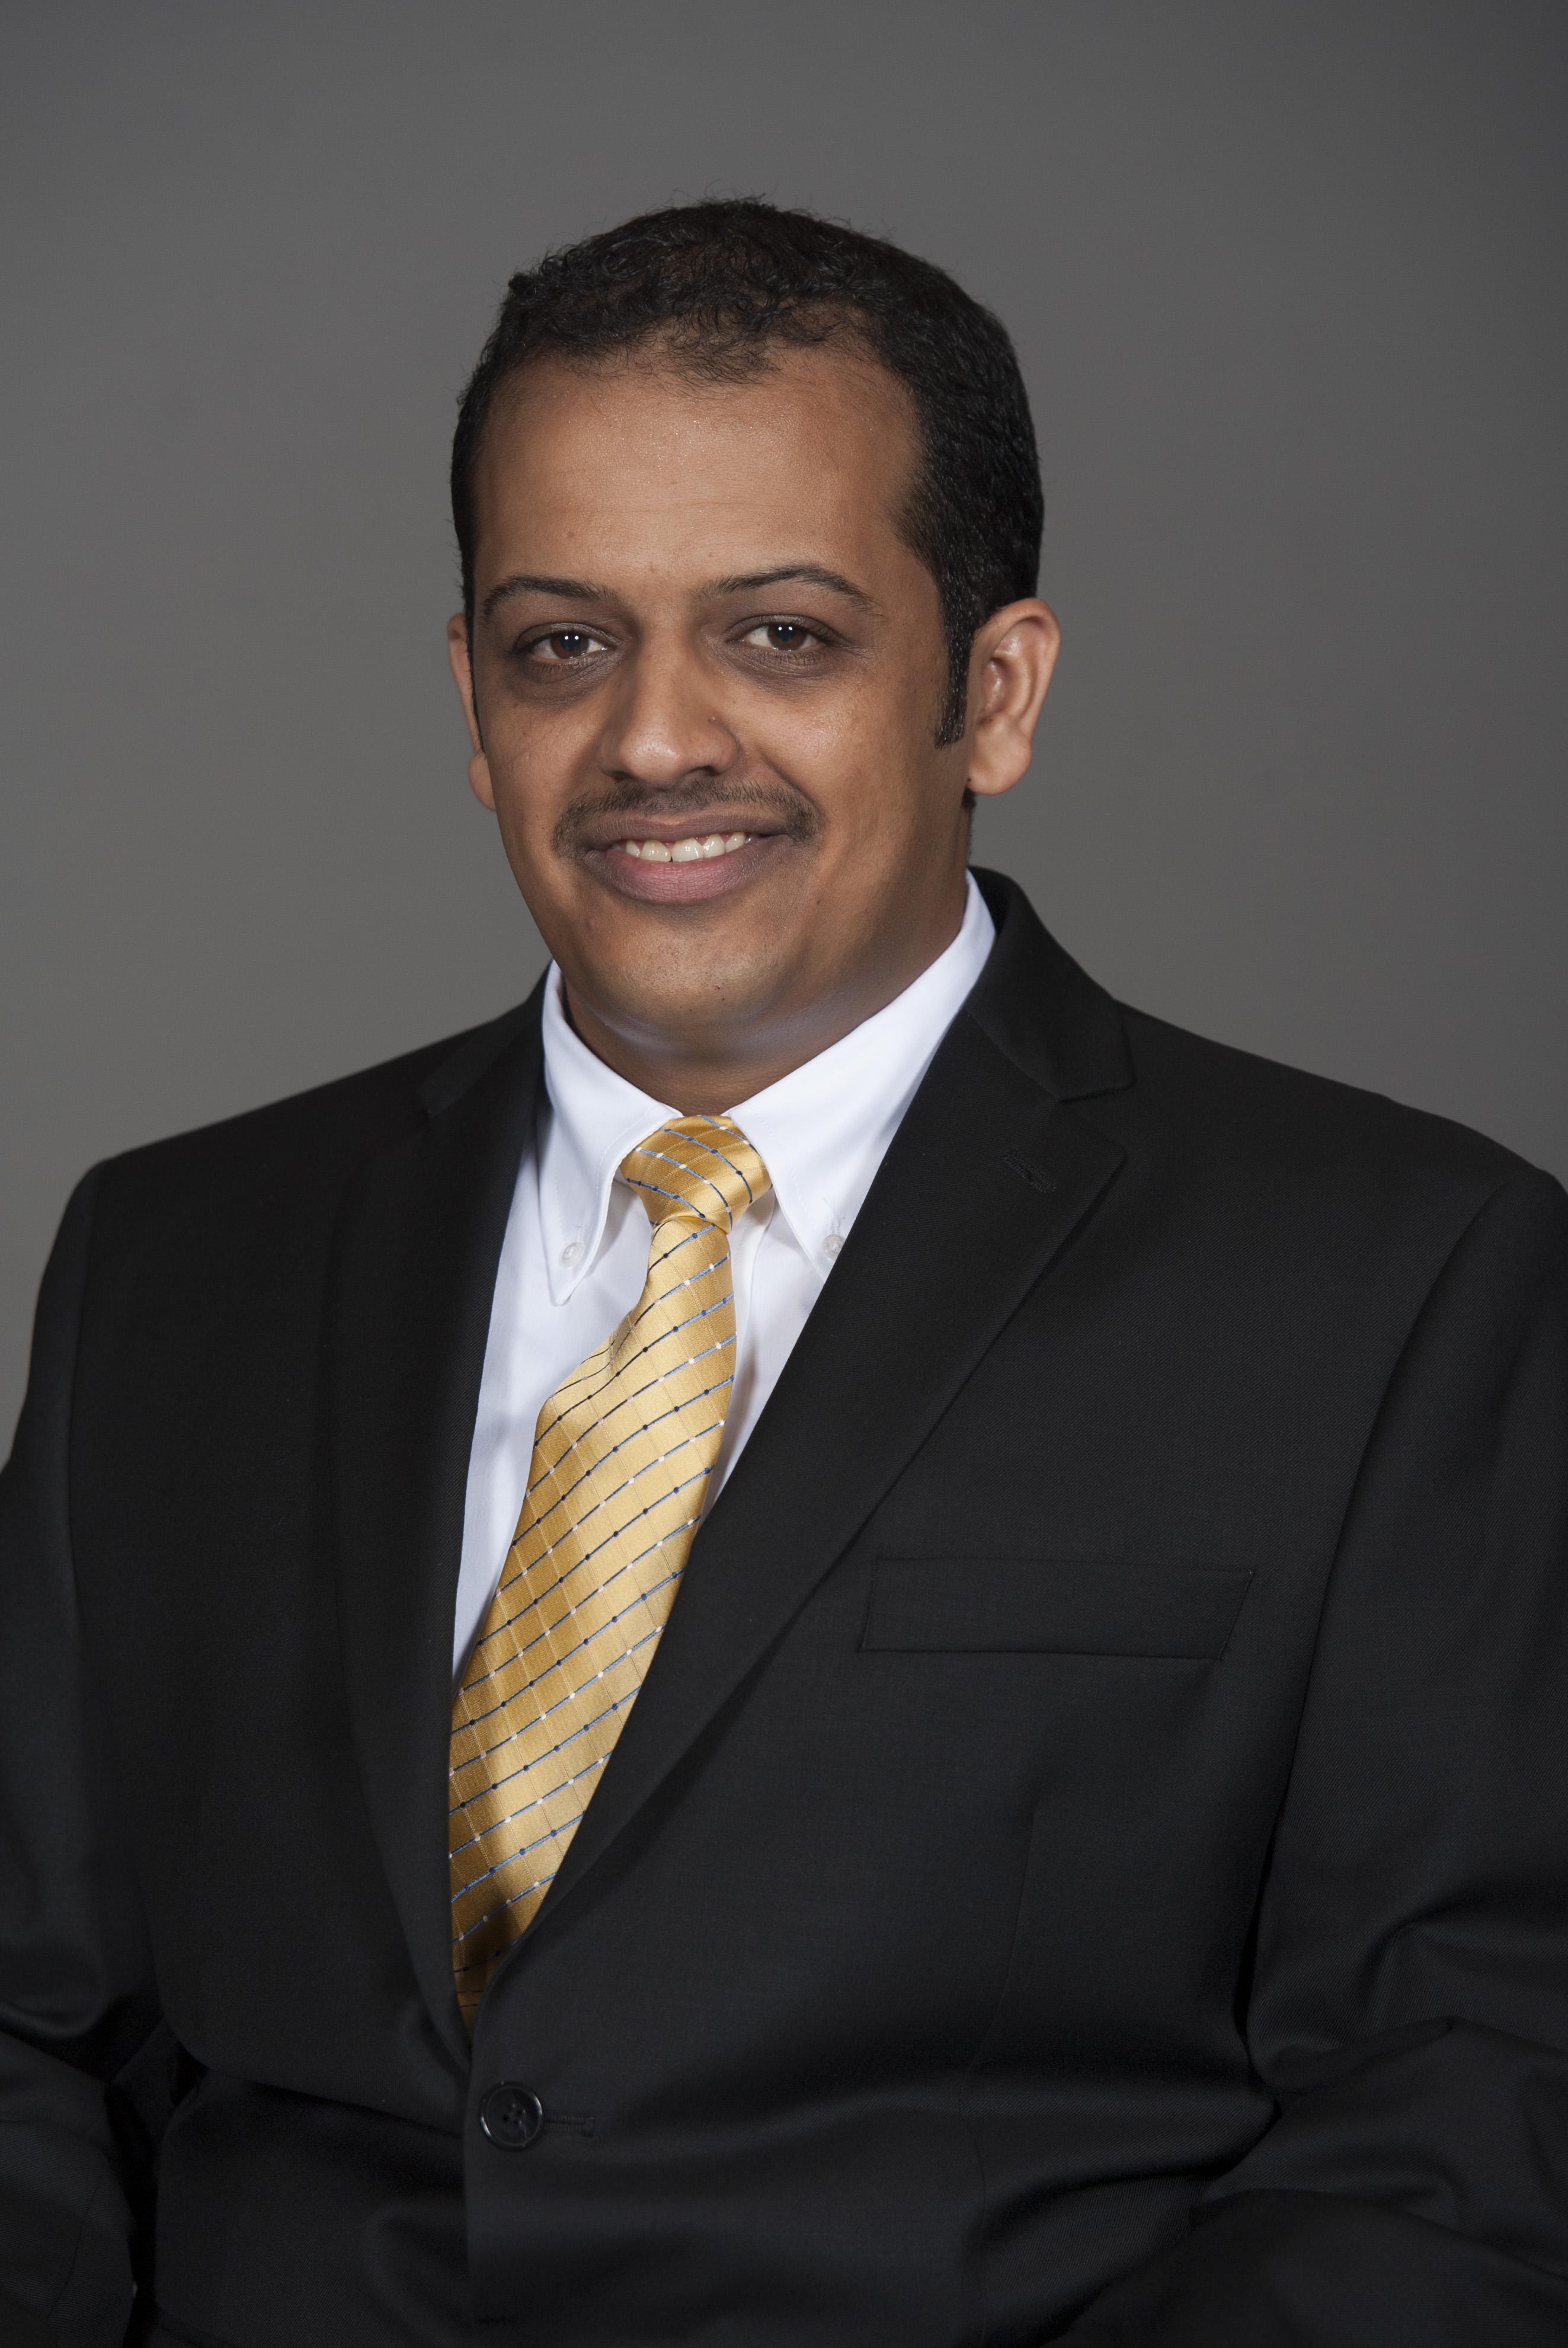 Abdul Homran